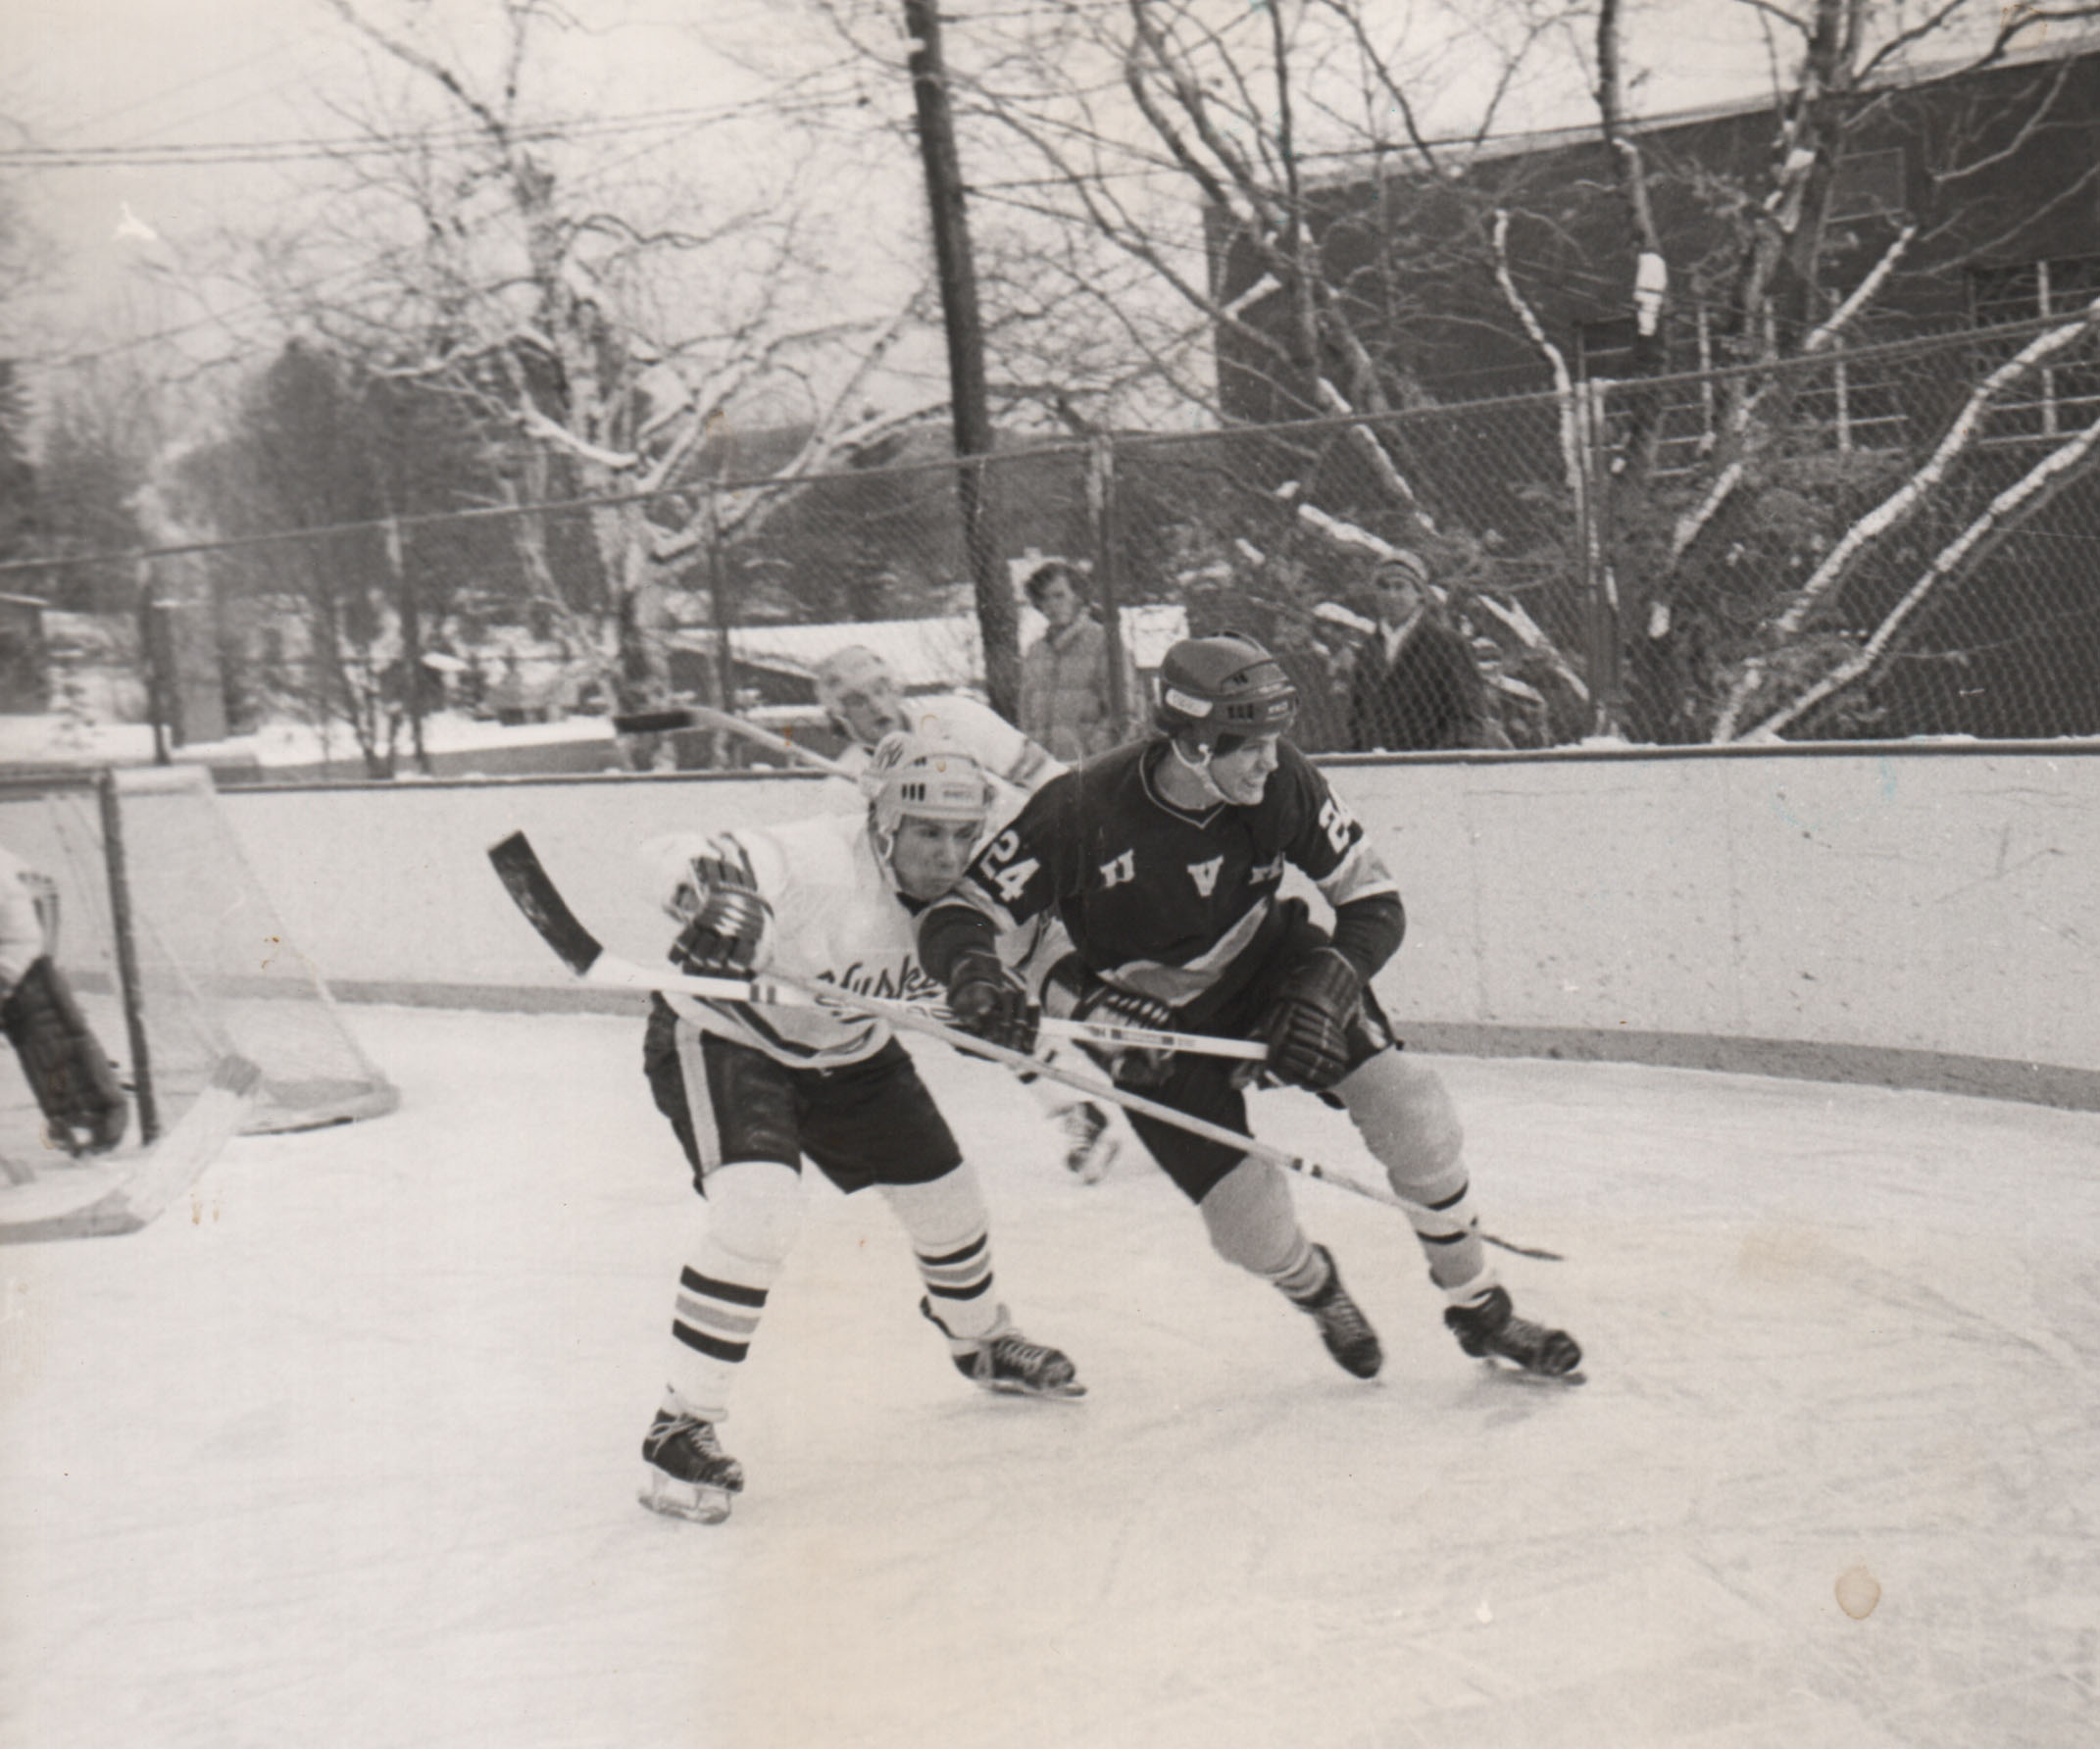 025Hockey.jpg